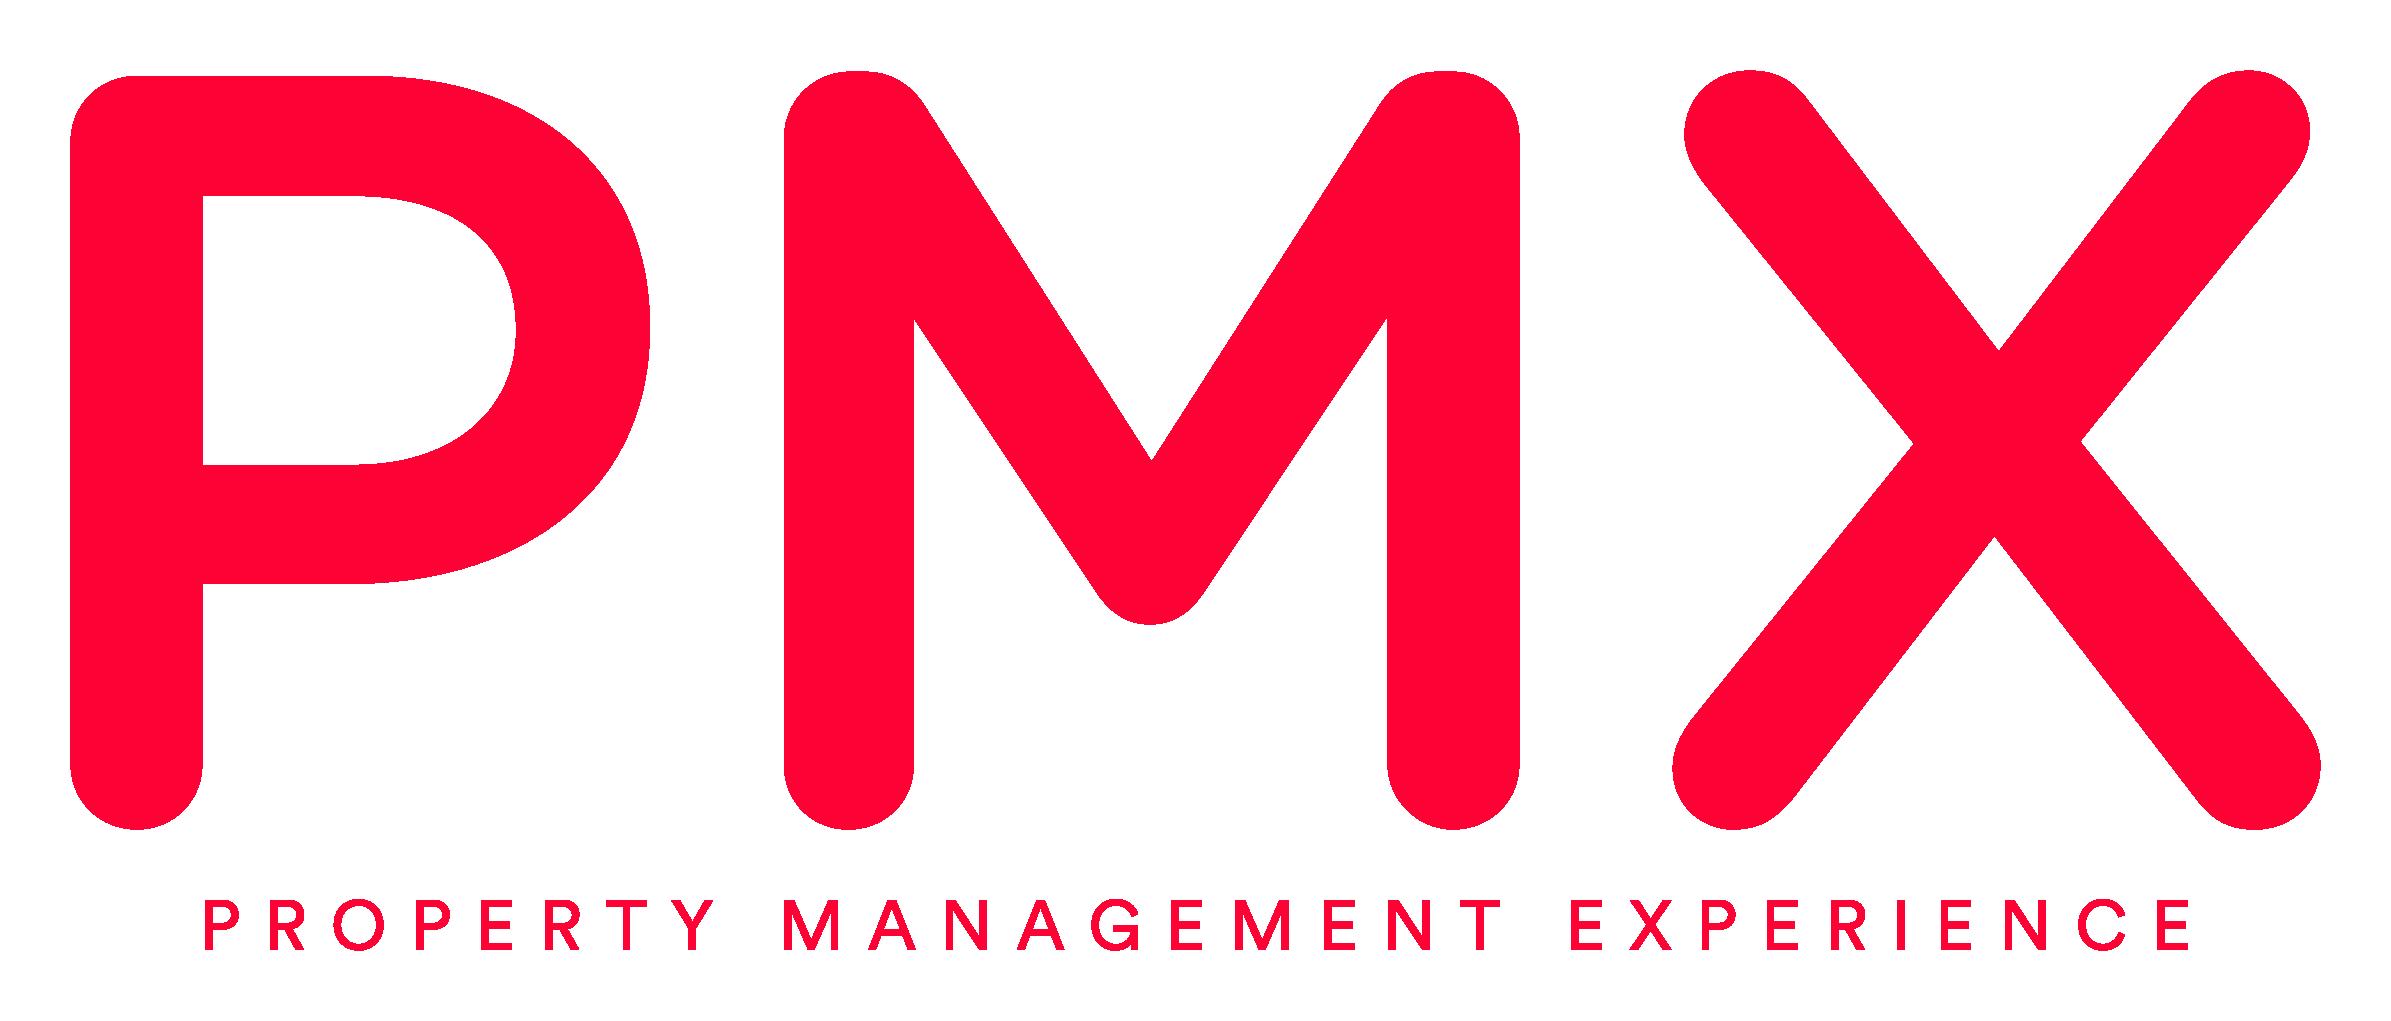 PMX Property